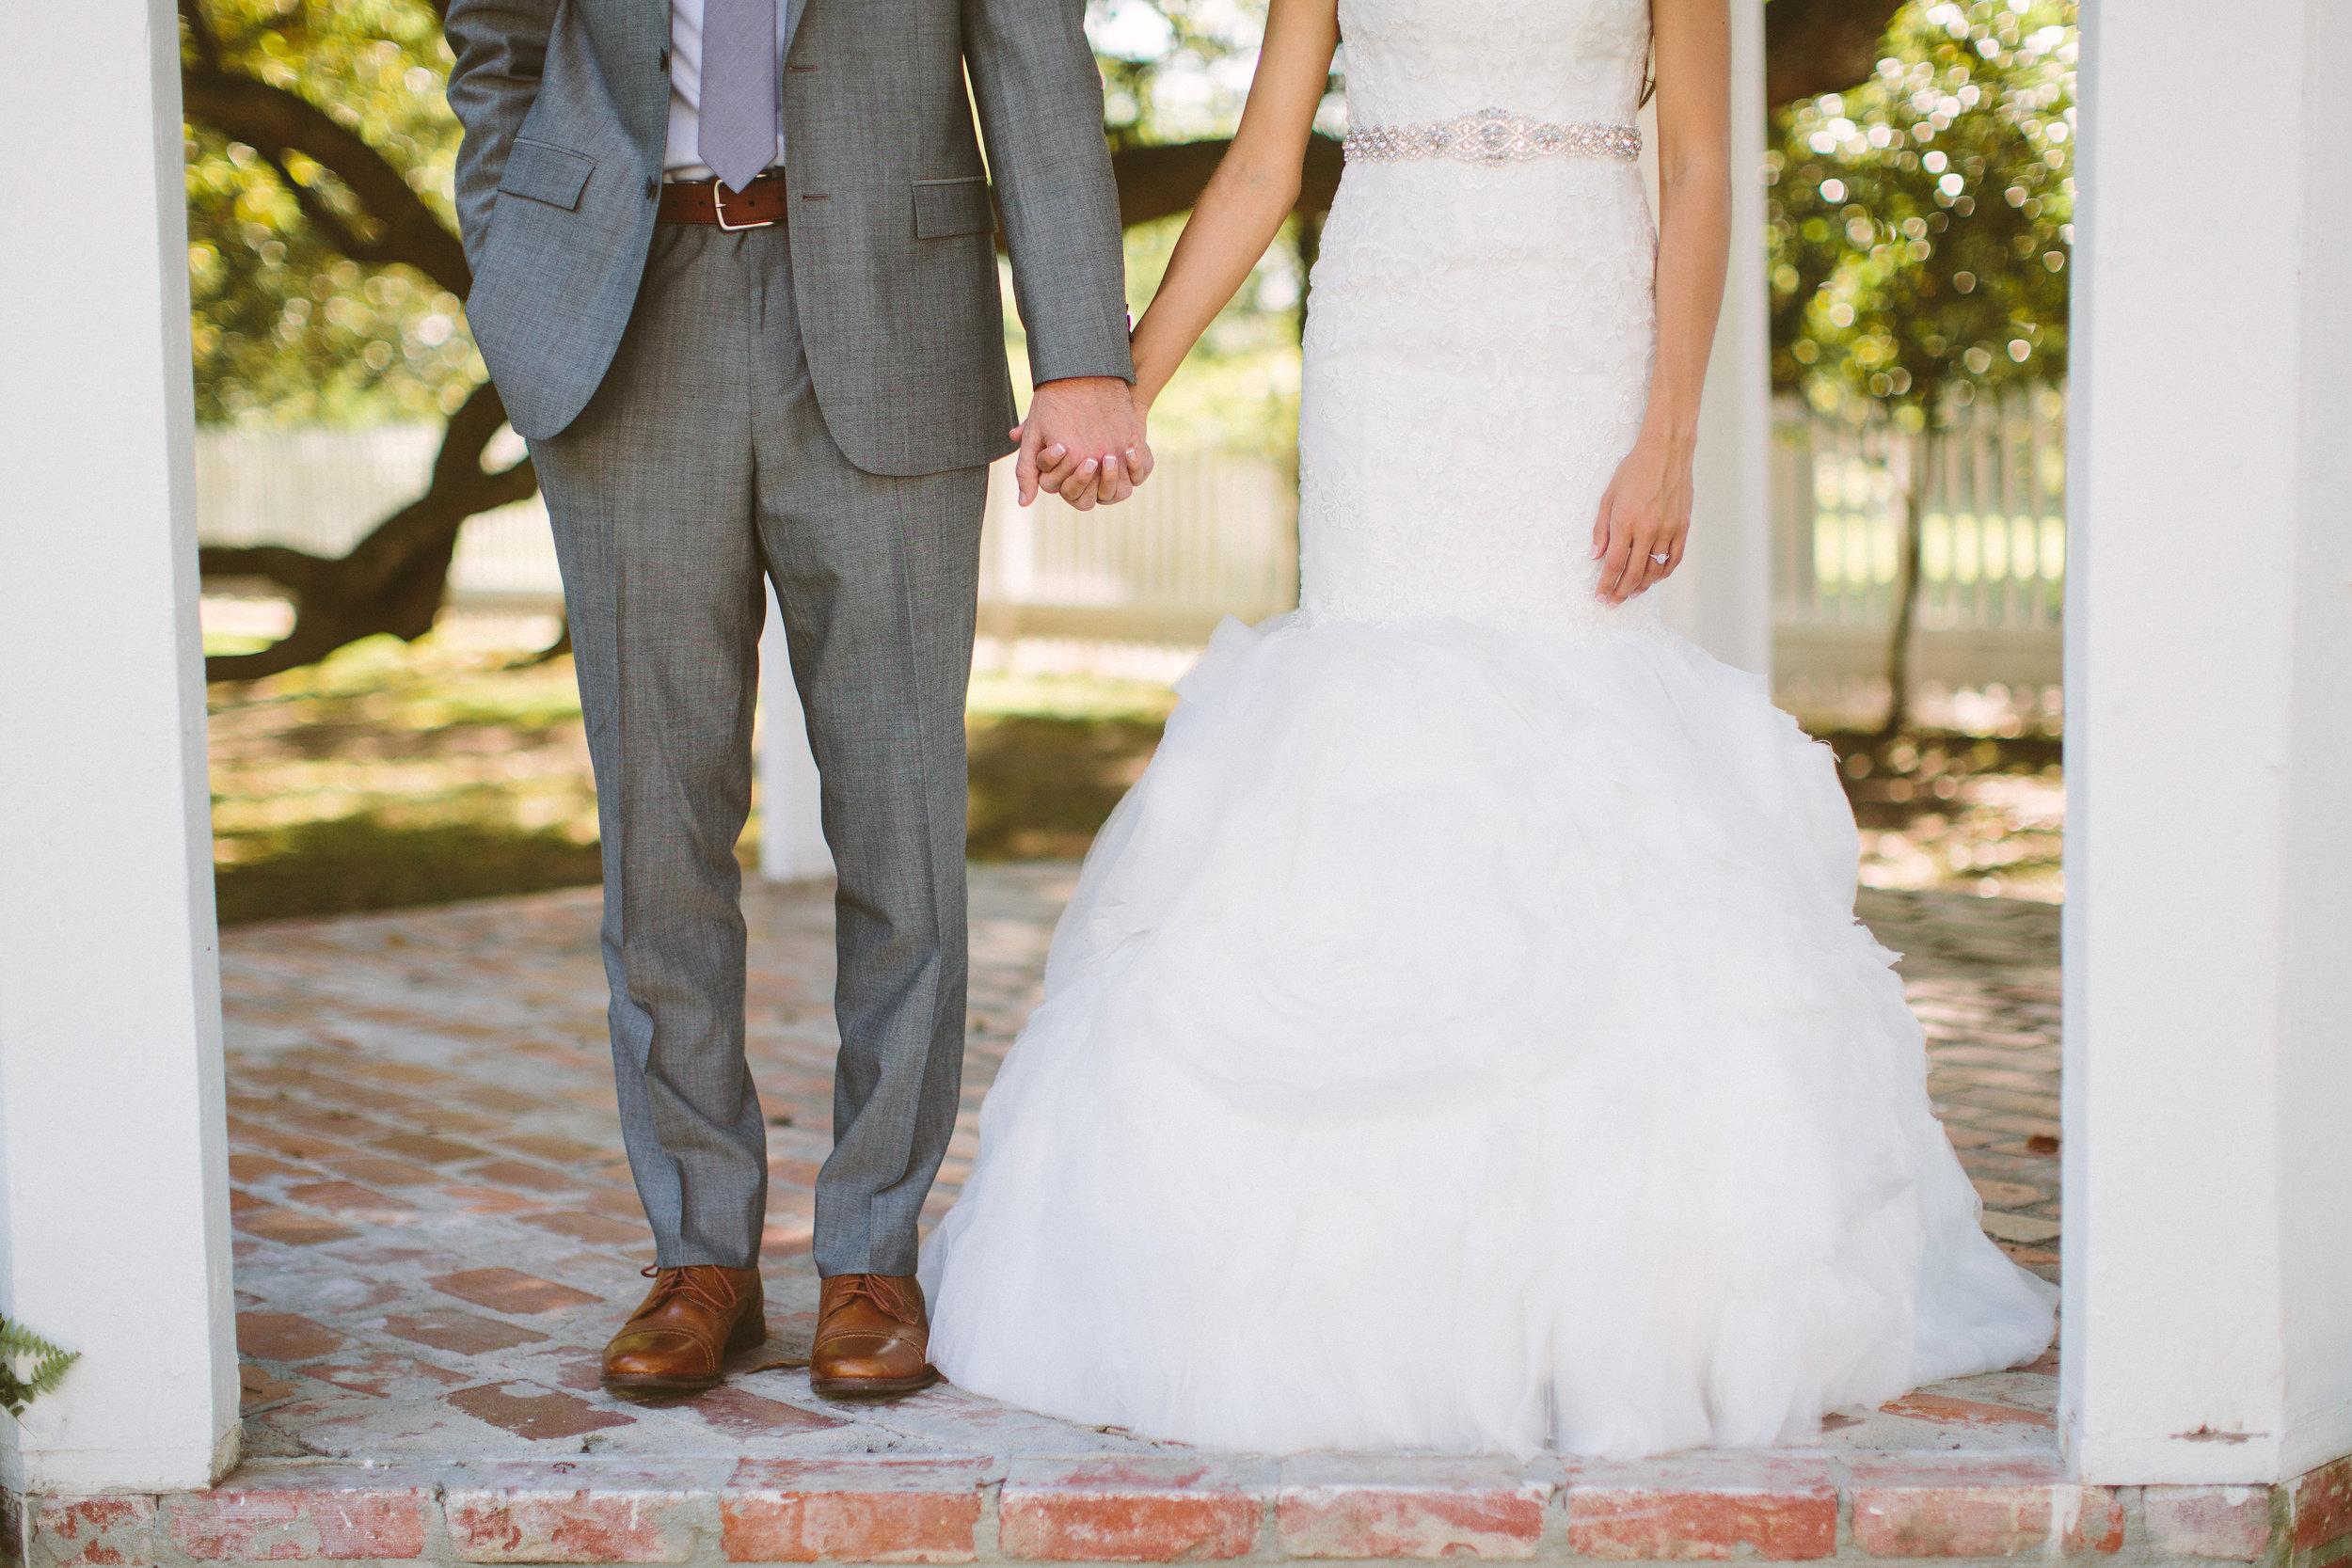 0334_short_wedding - Copy.jpg